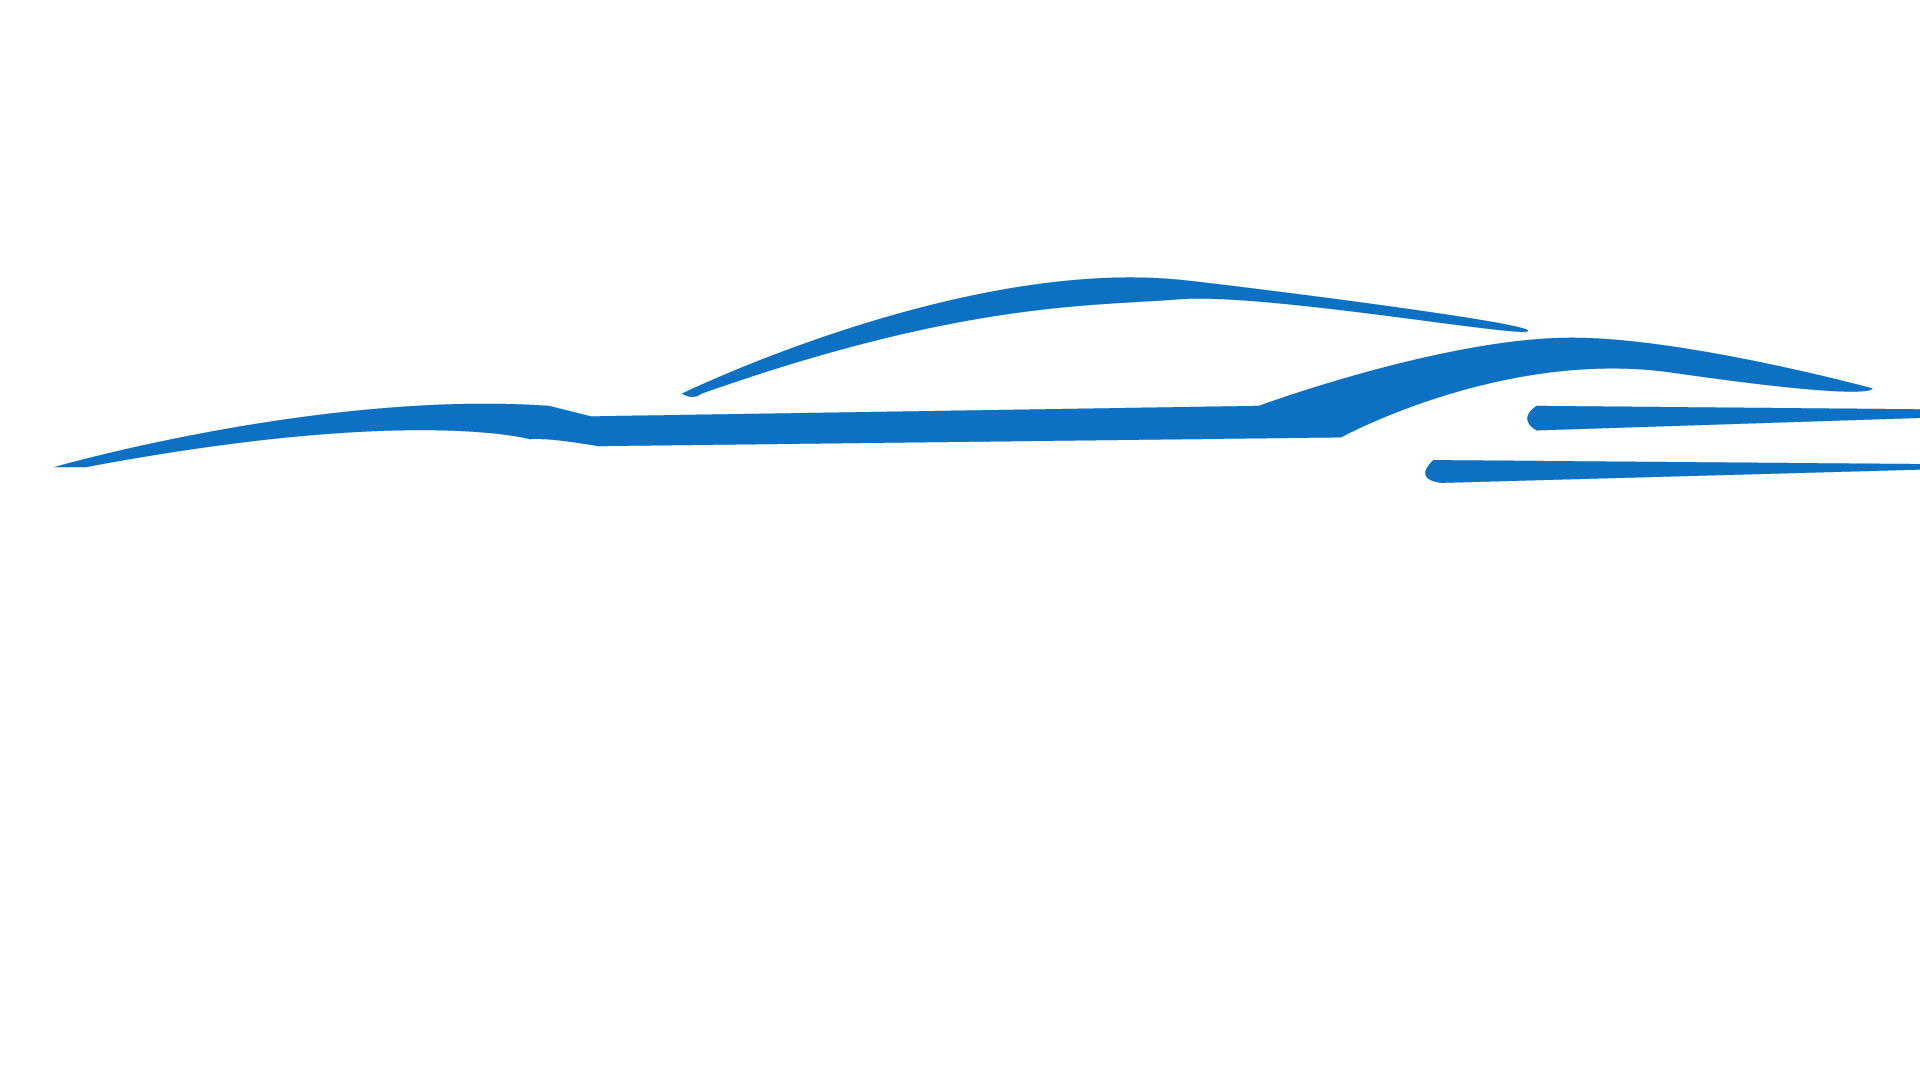 Rijschool Awin